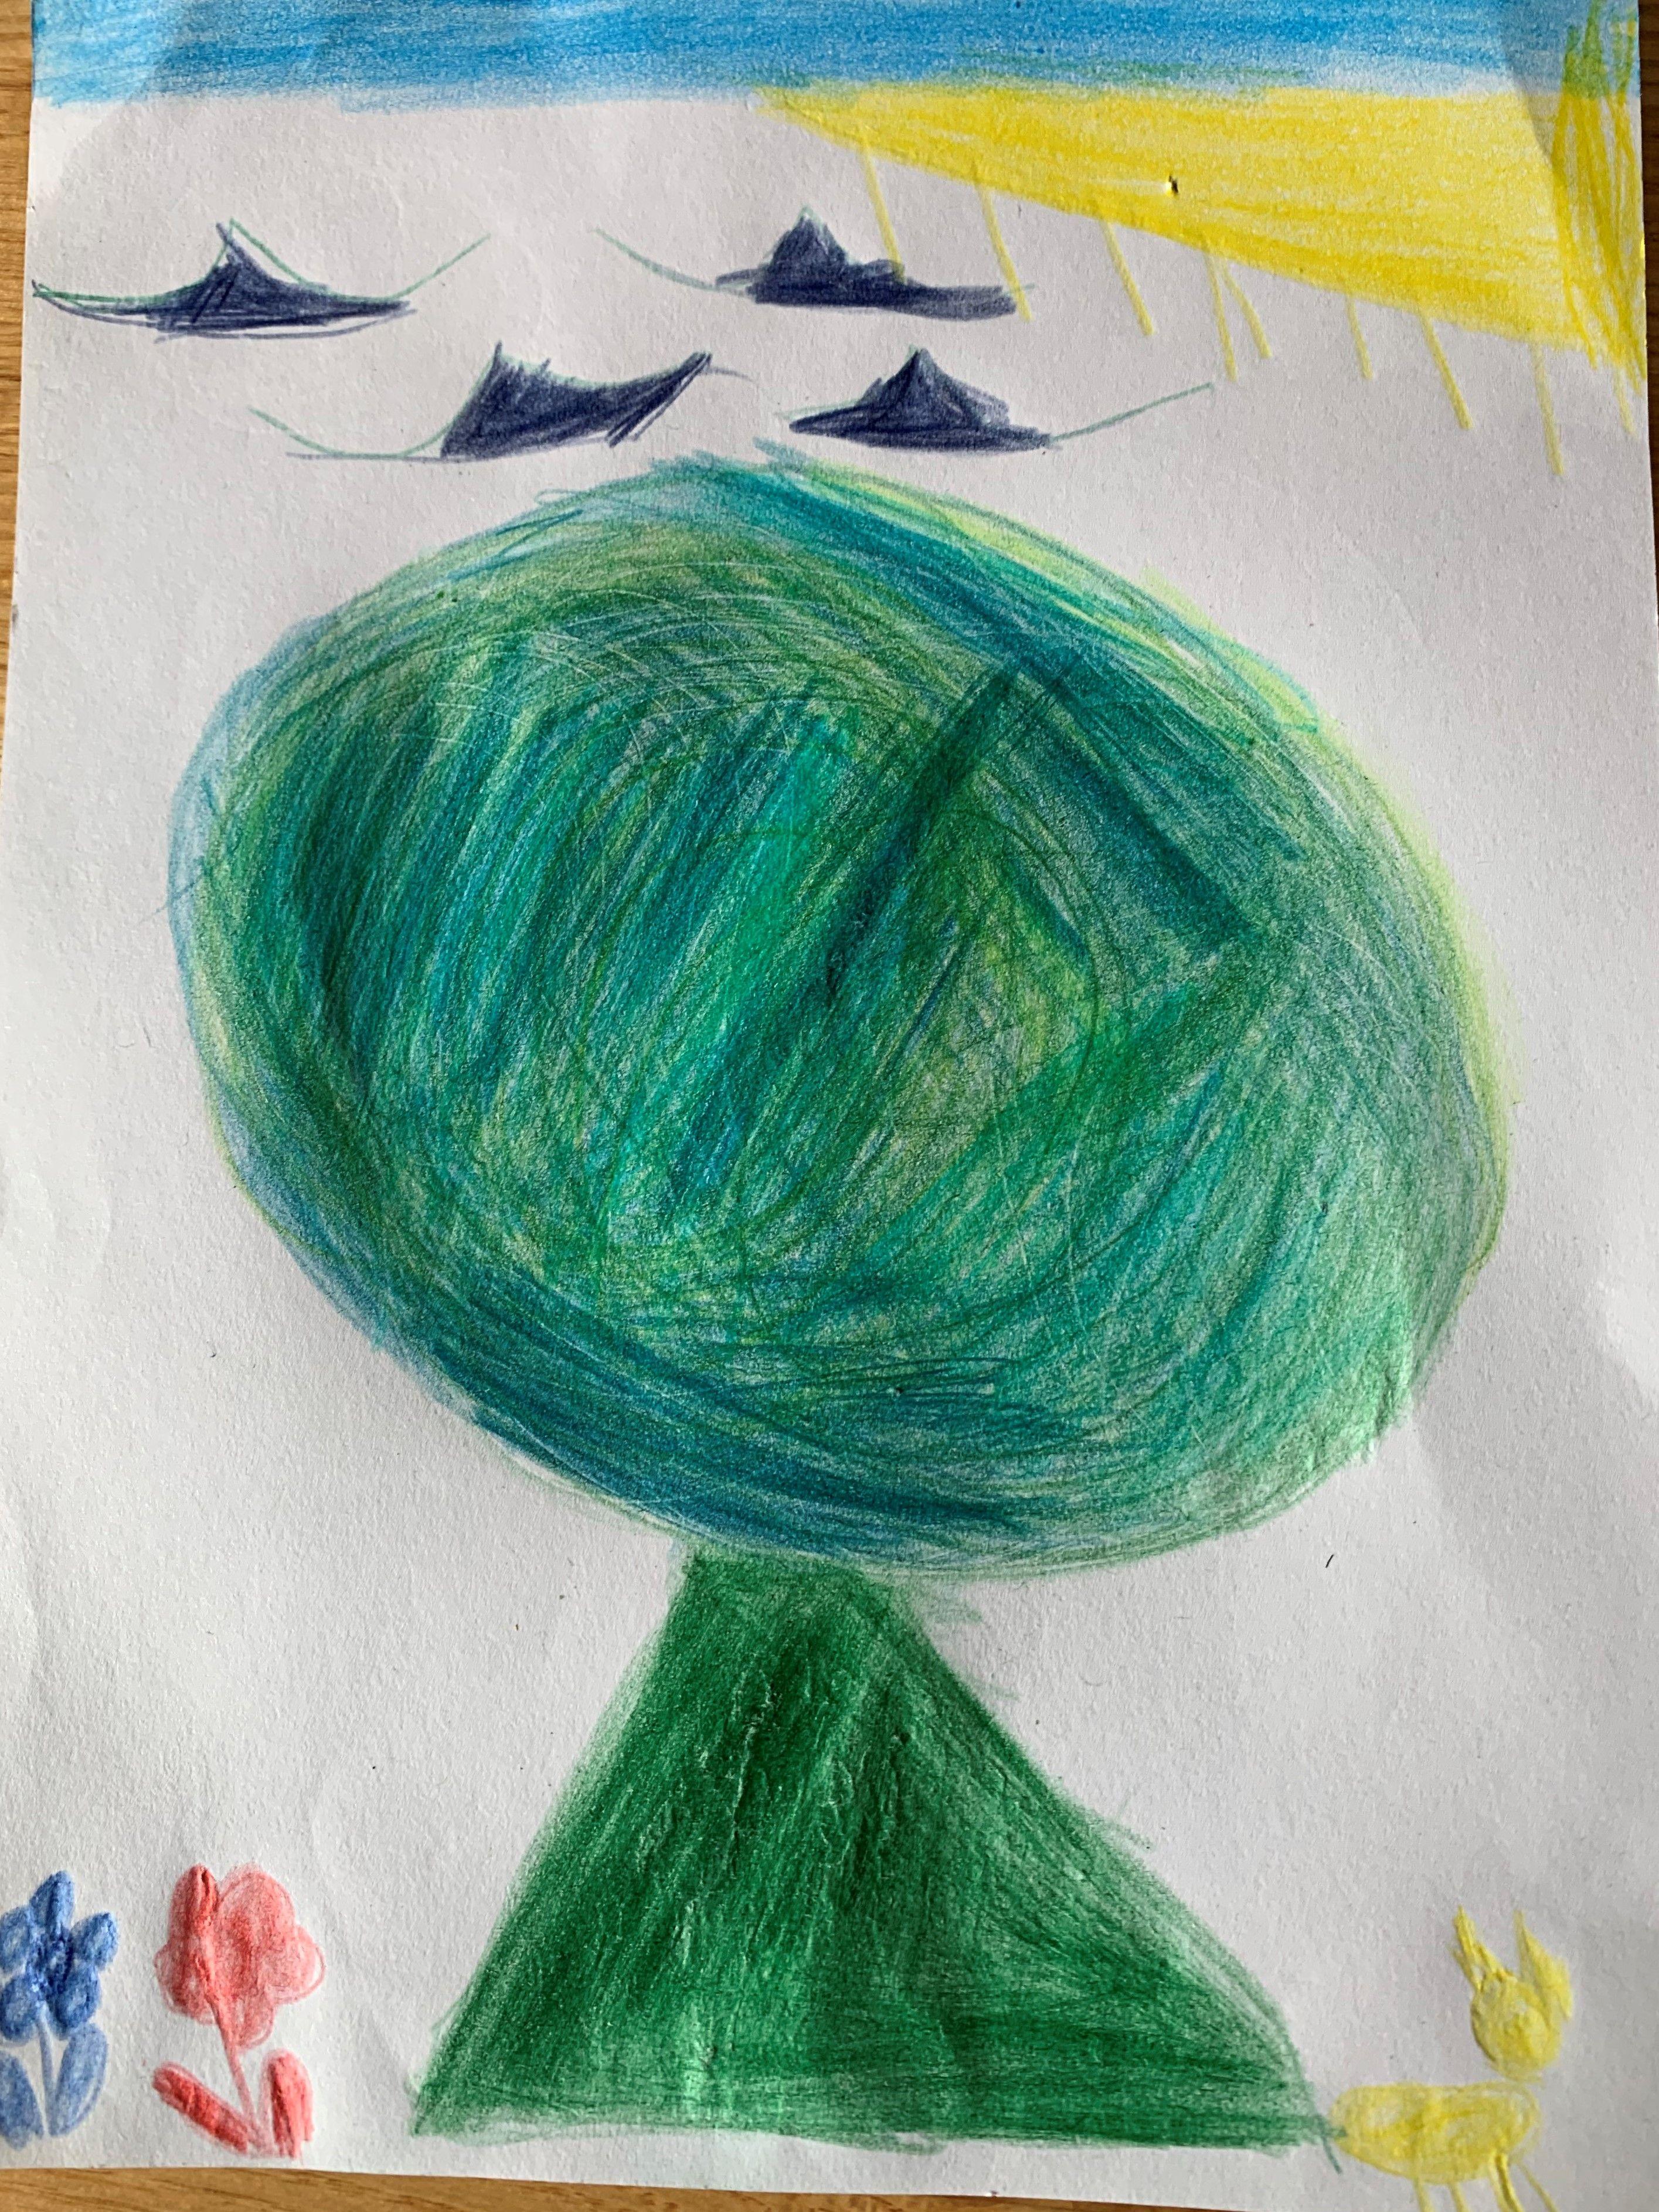 (8) The Pine Tree